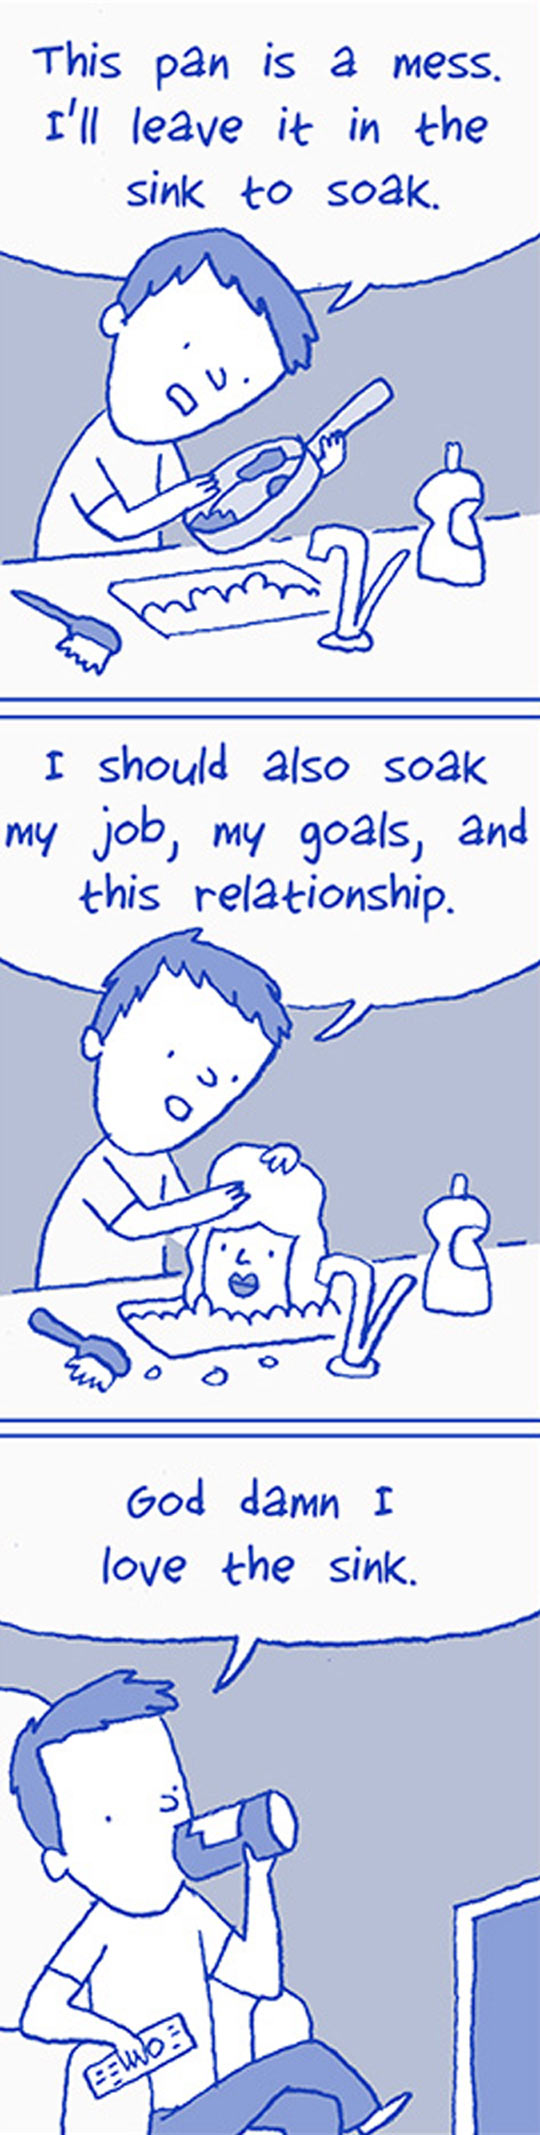 funny-webcomic-pan-messy-relationship